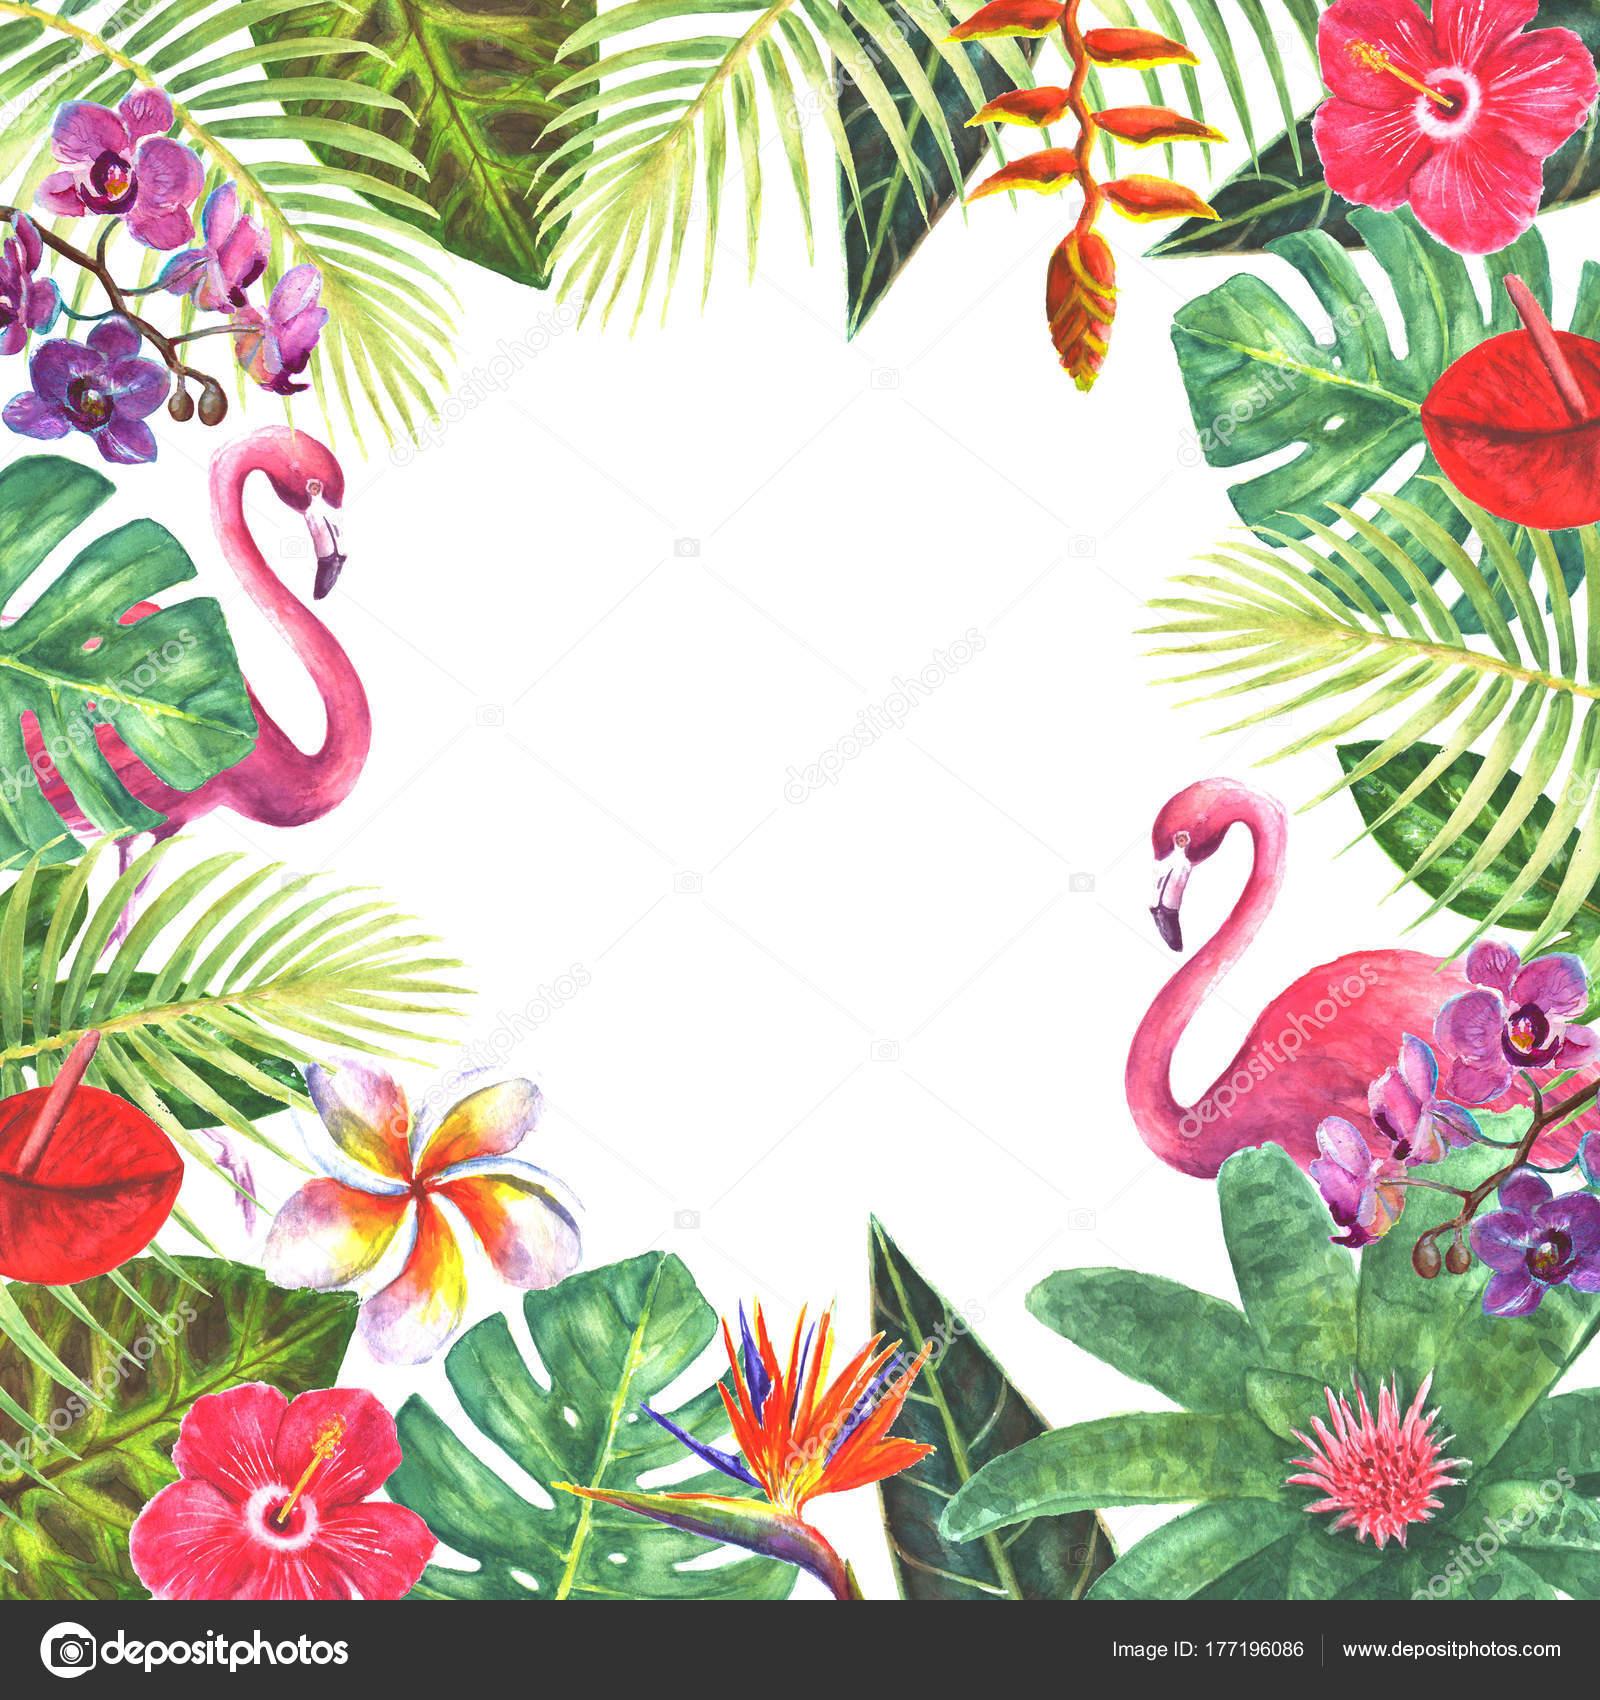 Phalaenopsis orchid flowers border frame decoration ...